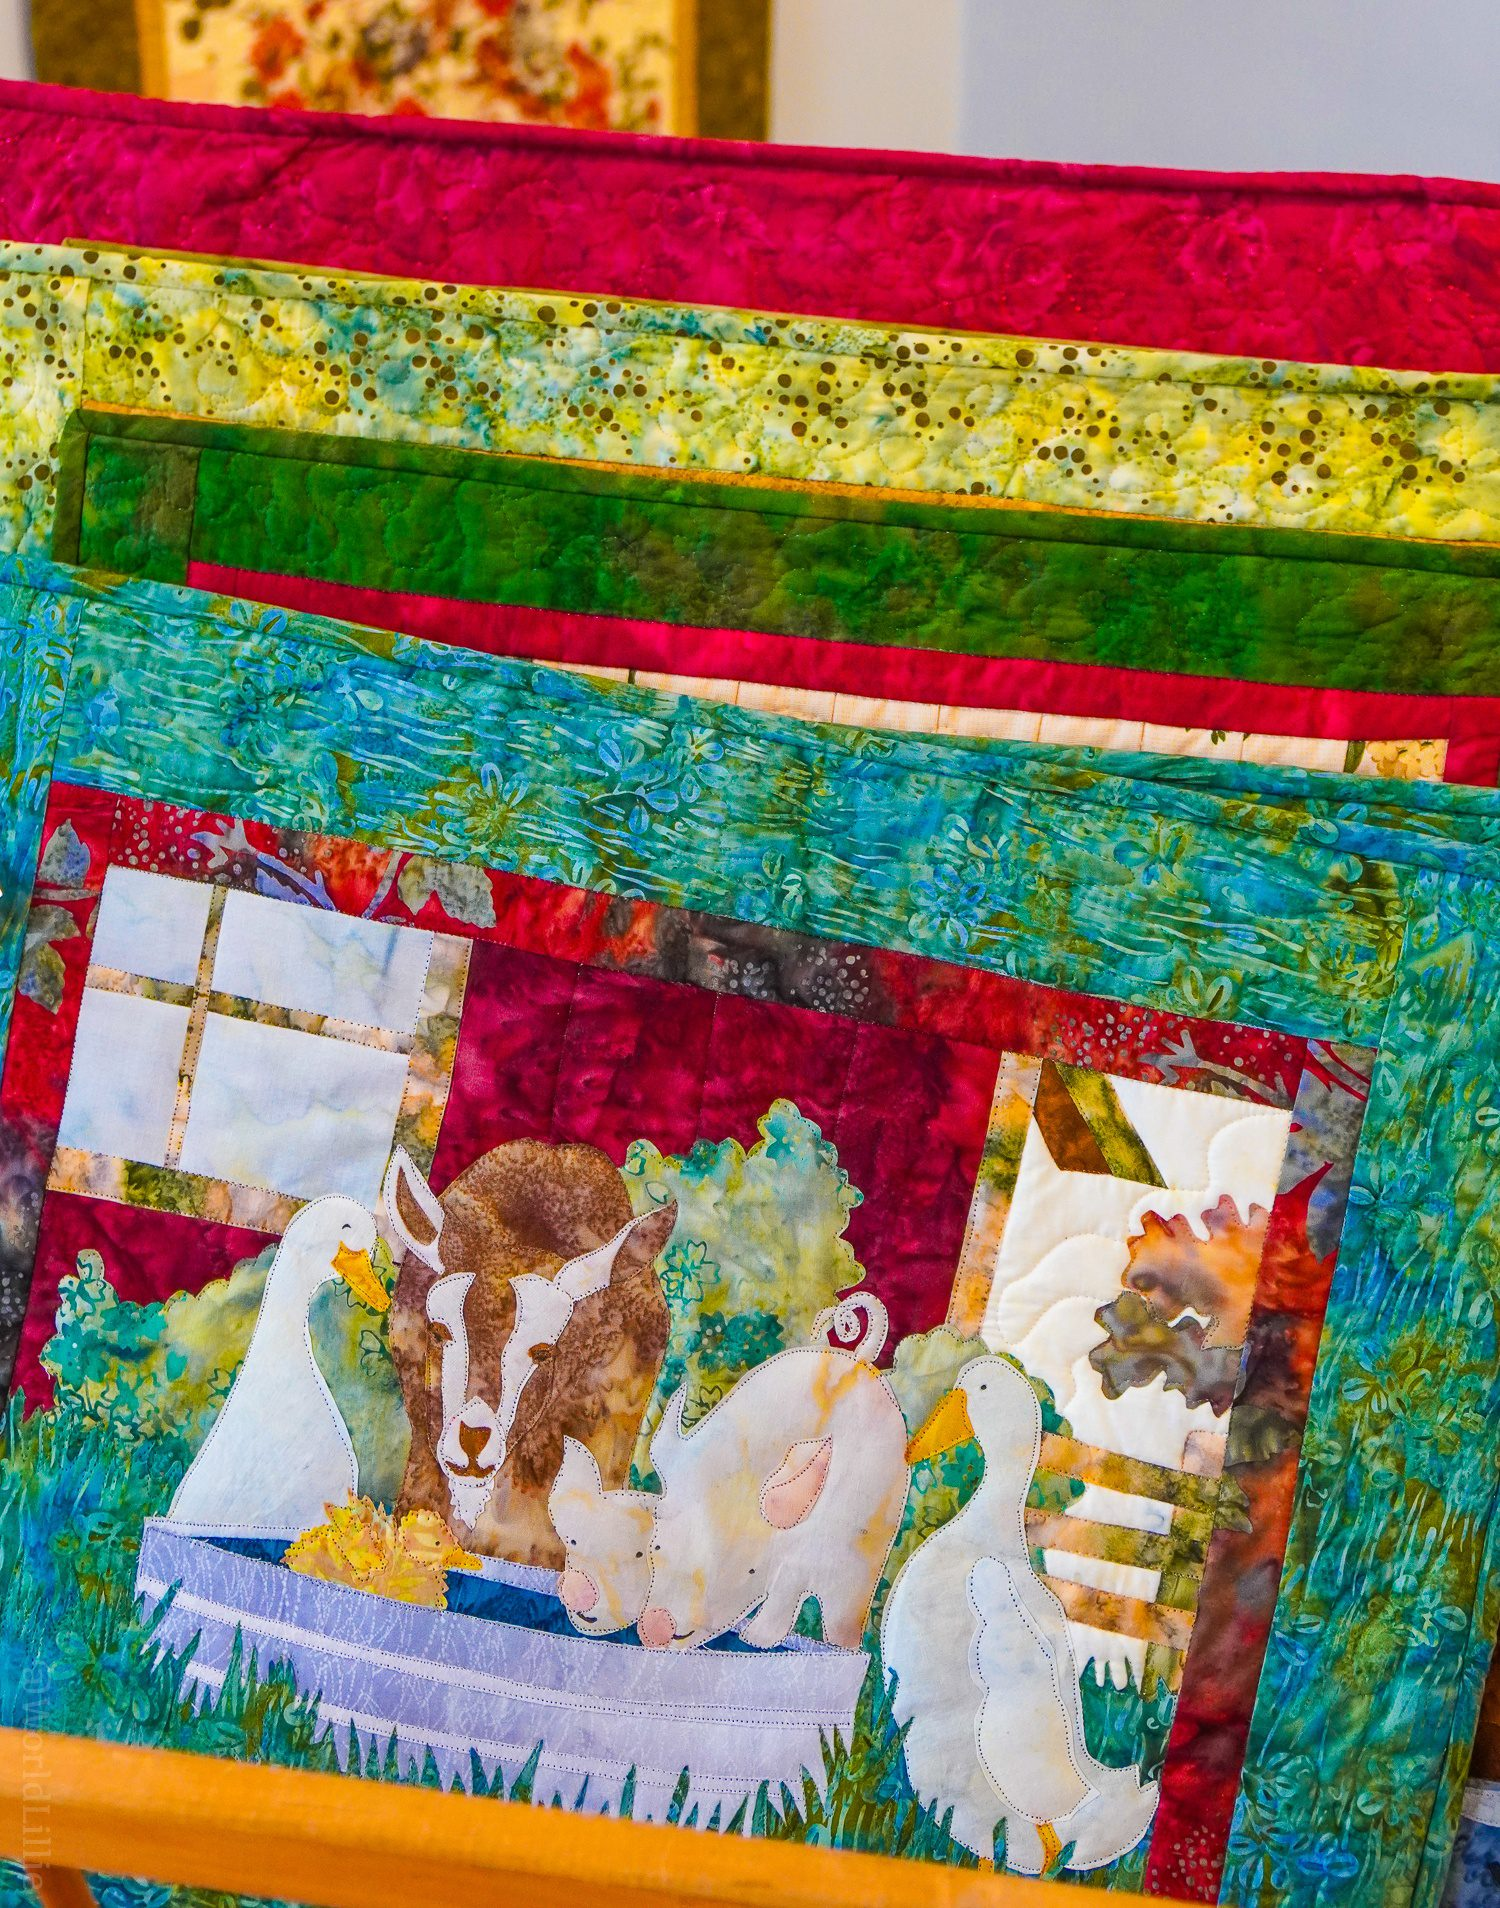 A hand-sewn quilt.